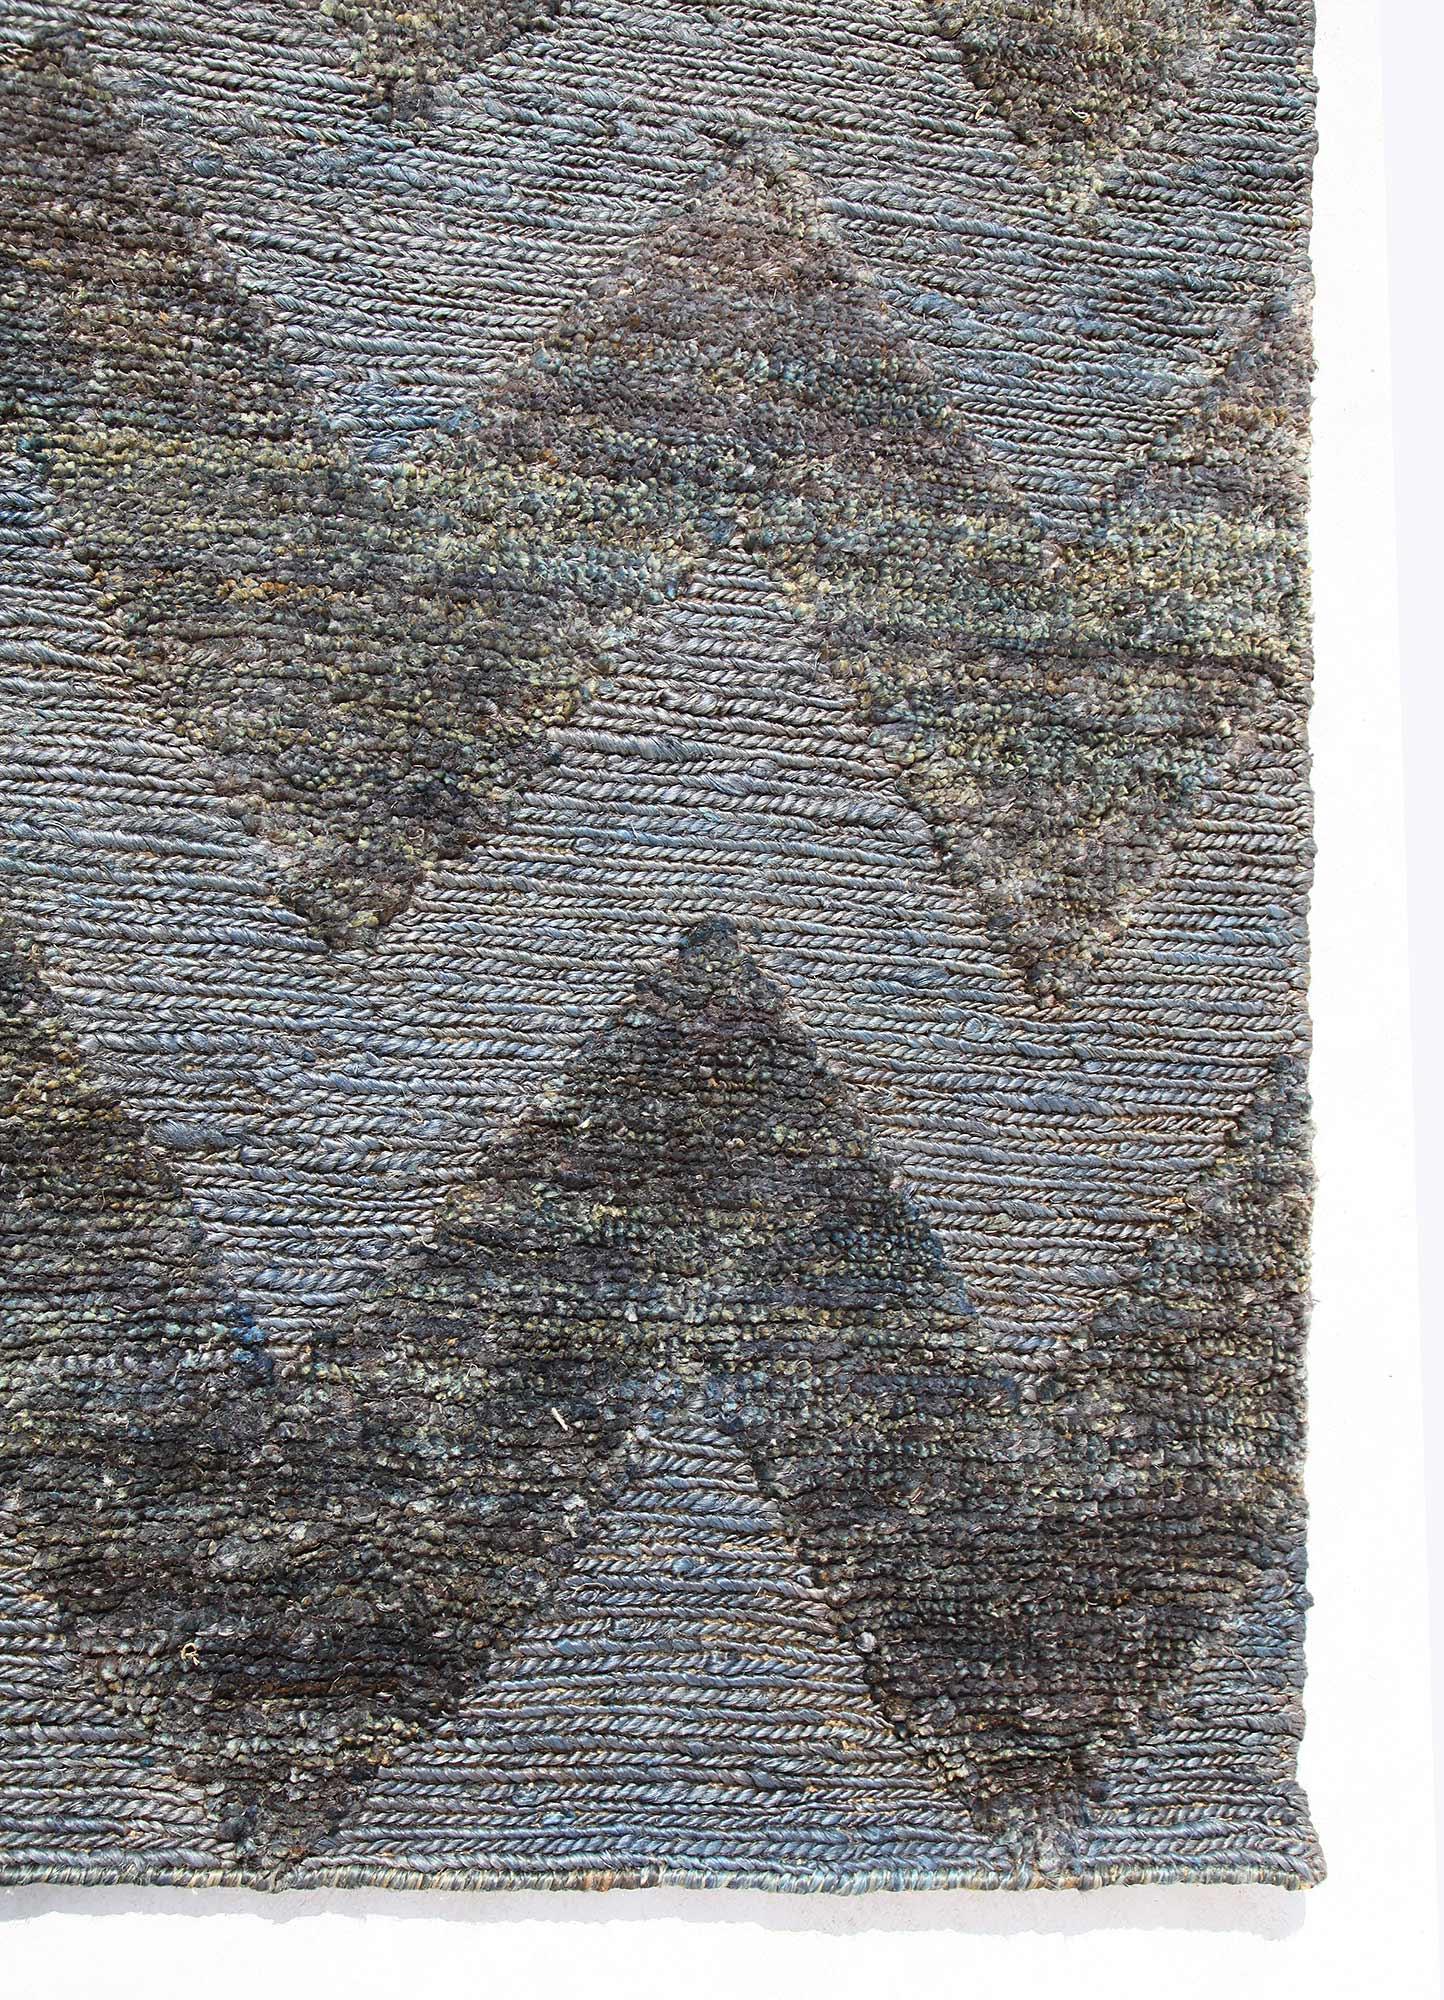 anatolia blue jute and hemp jute rugs Rug - Corner